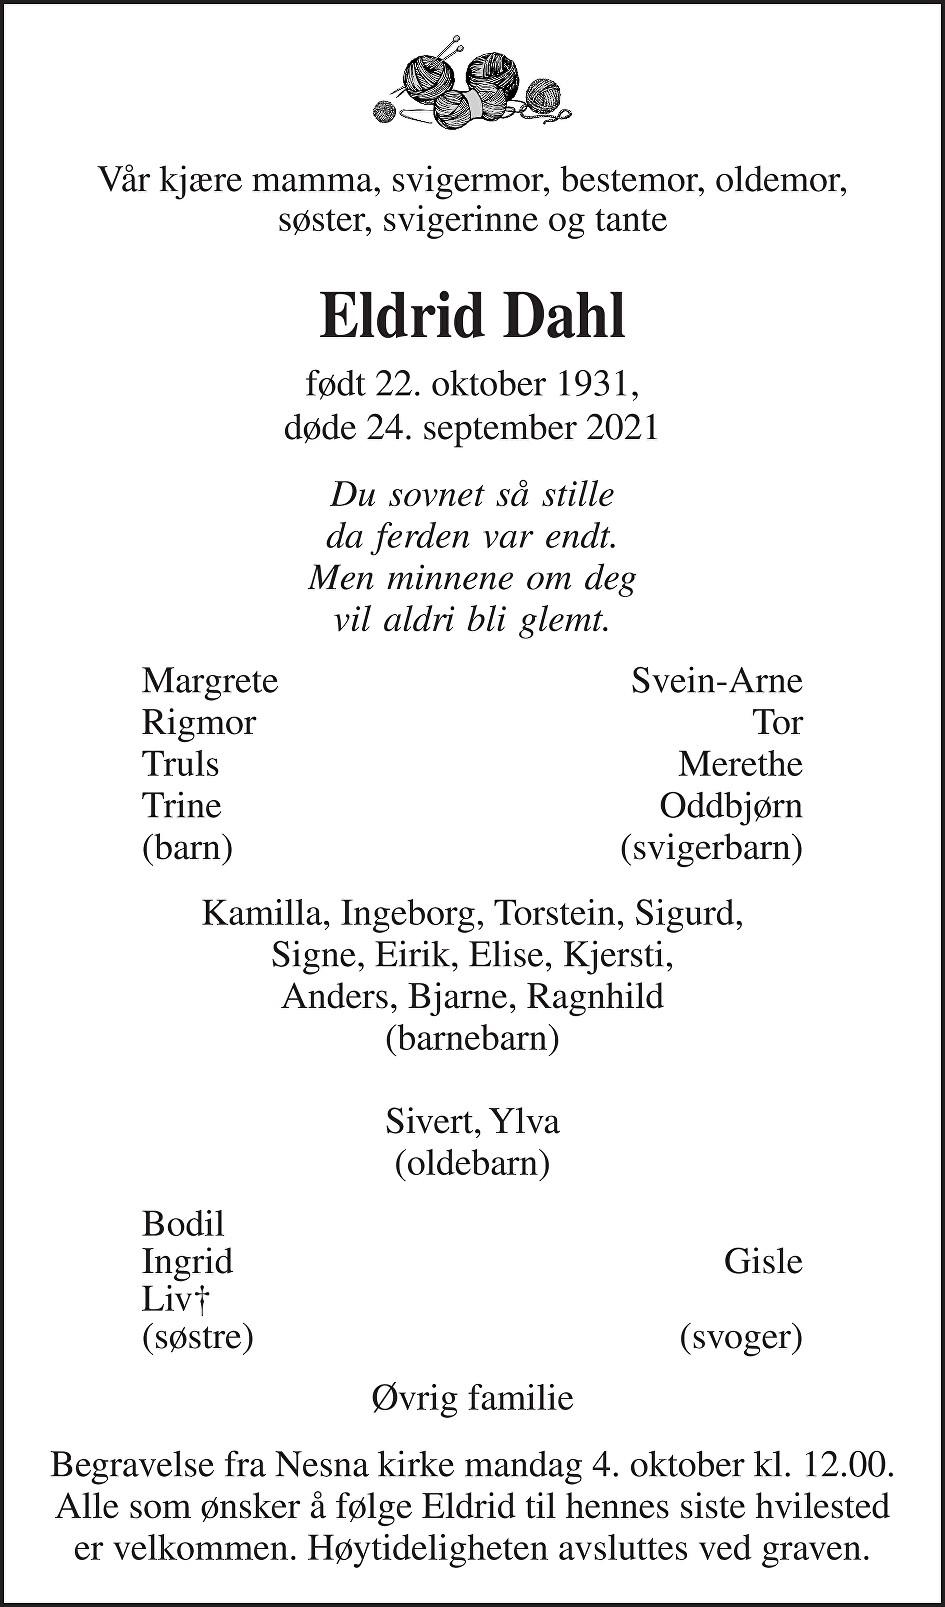 Eldrid Dahl Dødsannonse